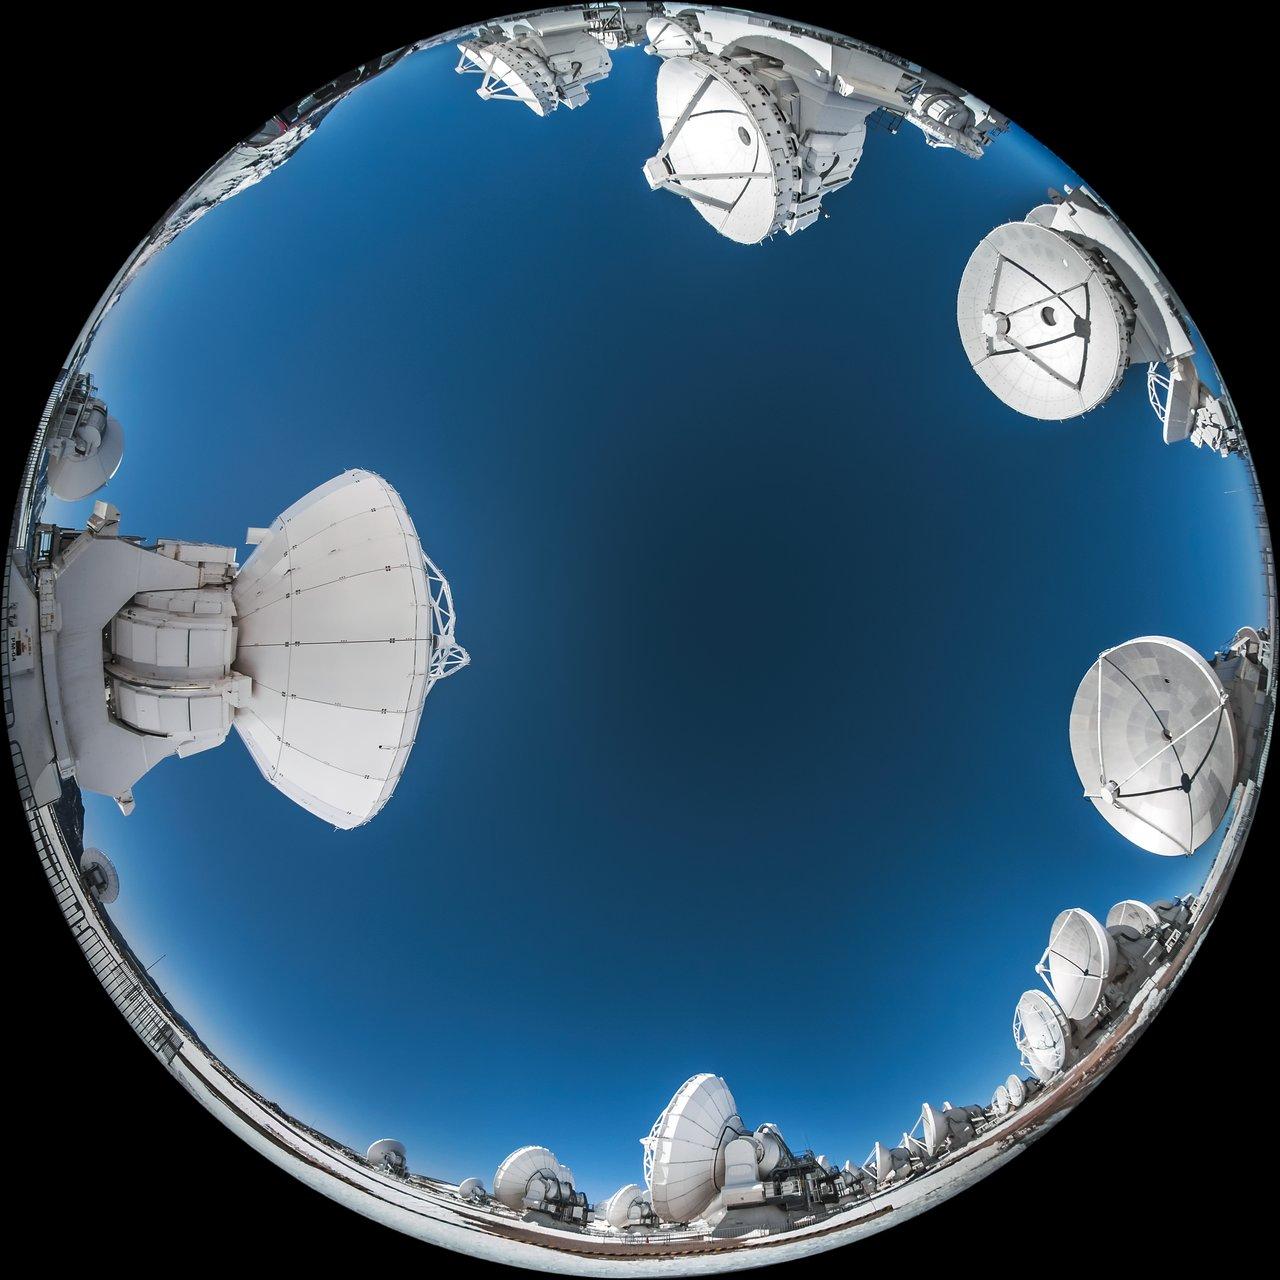 A fisheye view of ALMA.  Credit: ESO/A. Ghizzi Panizza (www.albertoghizzipanizza.com).